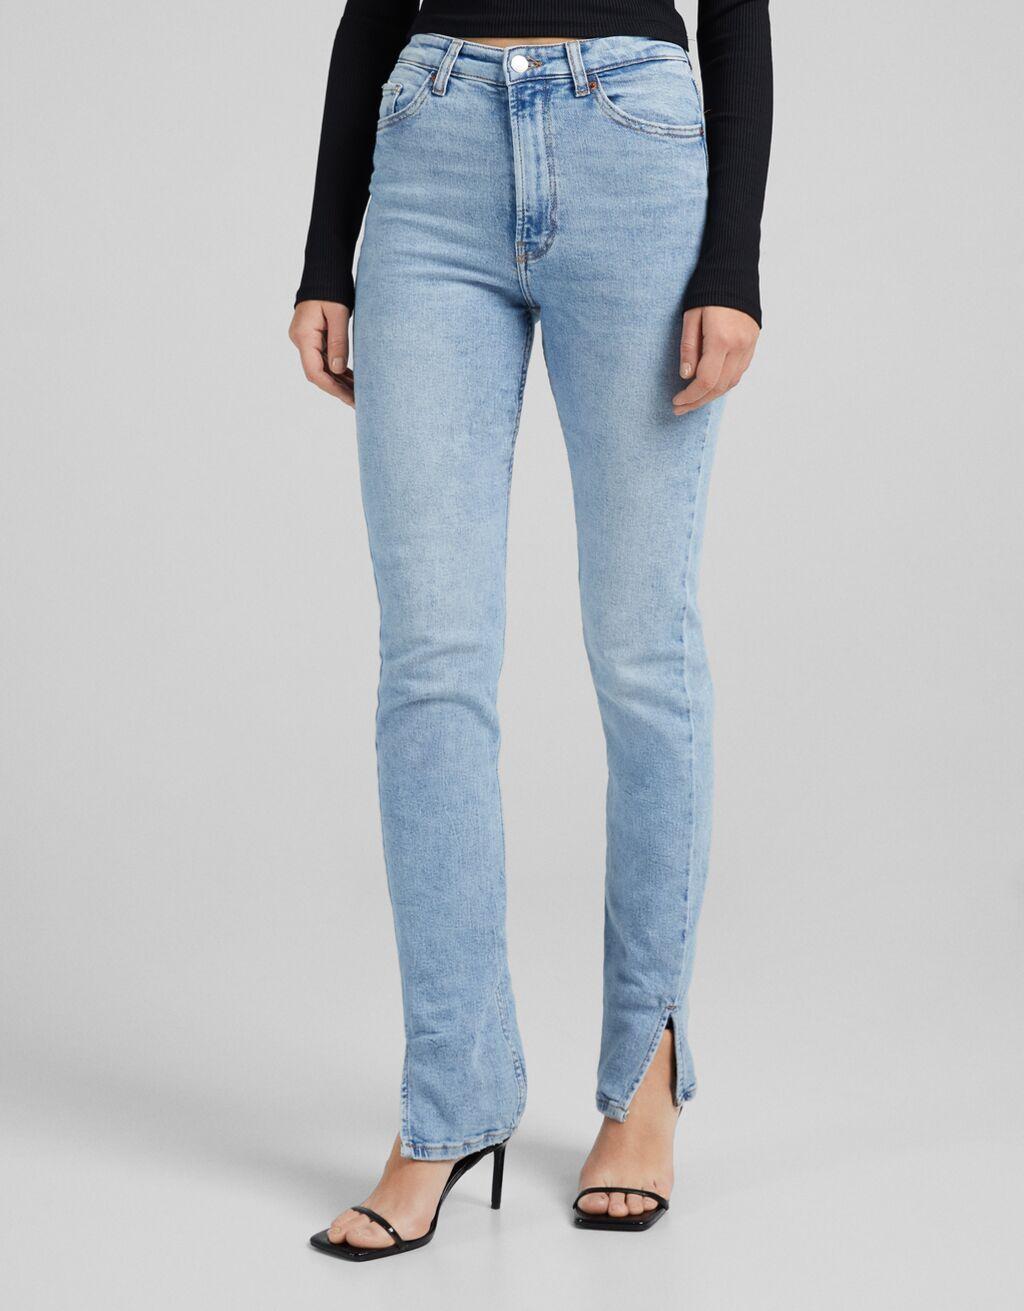 High waist skinny jeans with slit